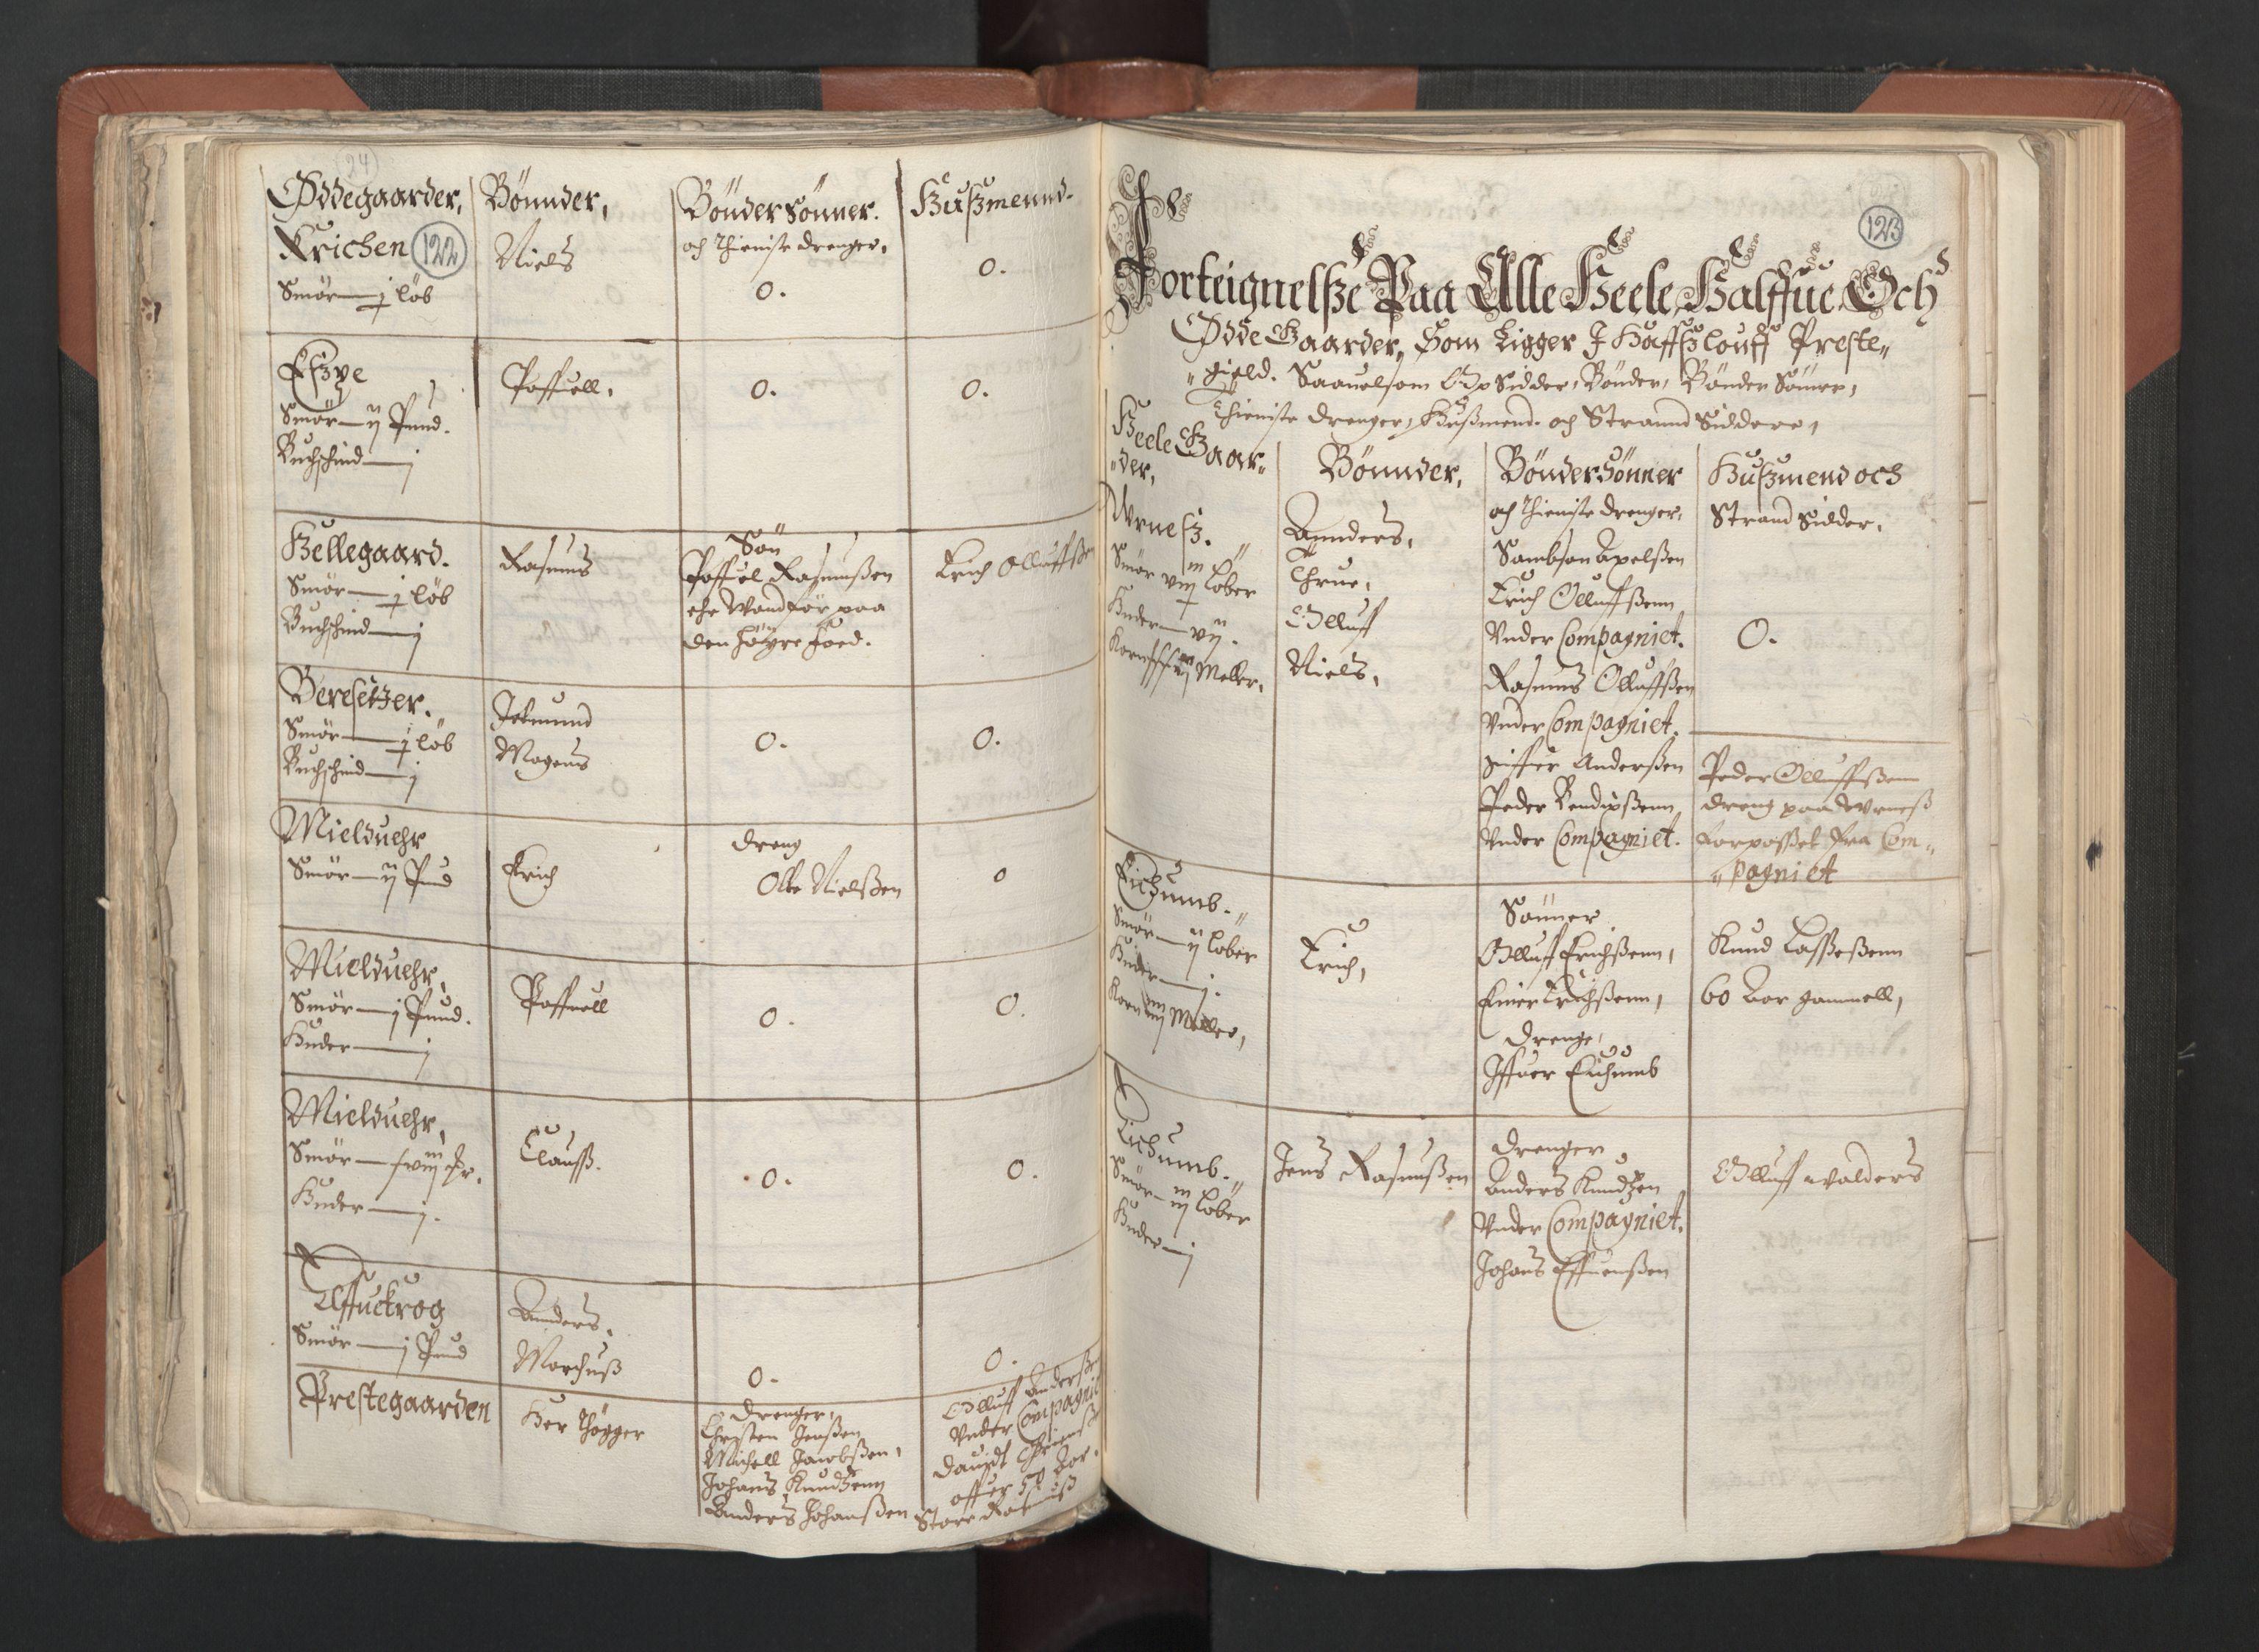 RA, Fogdenes og sorenskrivernes manntall 1664-1666, nr. 14: Hardanger len, Ytre Sogn fogderi og Indre Sogn fogderi, 1664-1665, s. 122-123